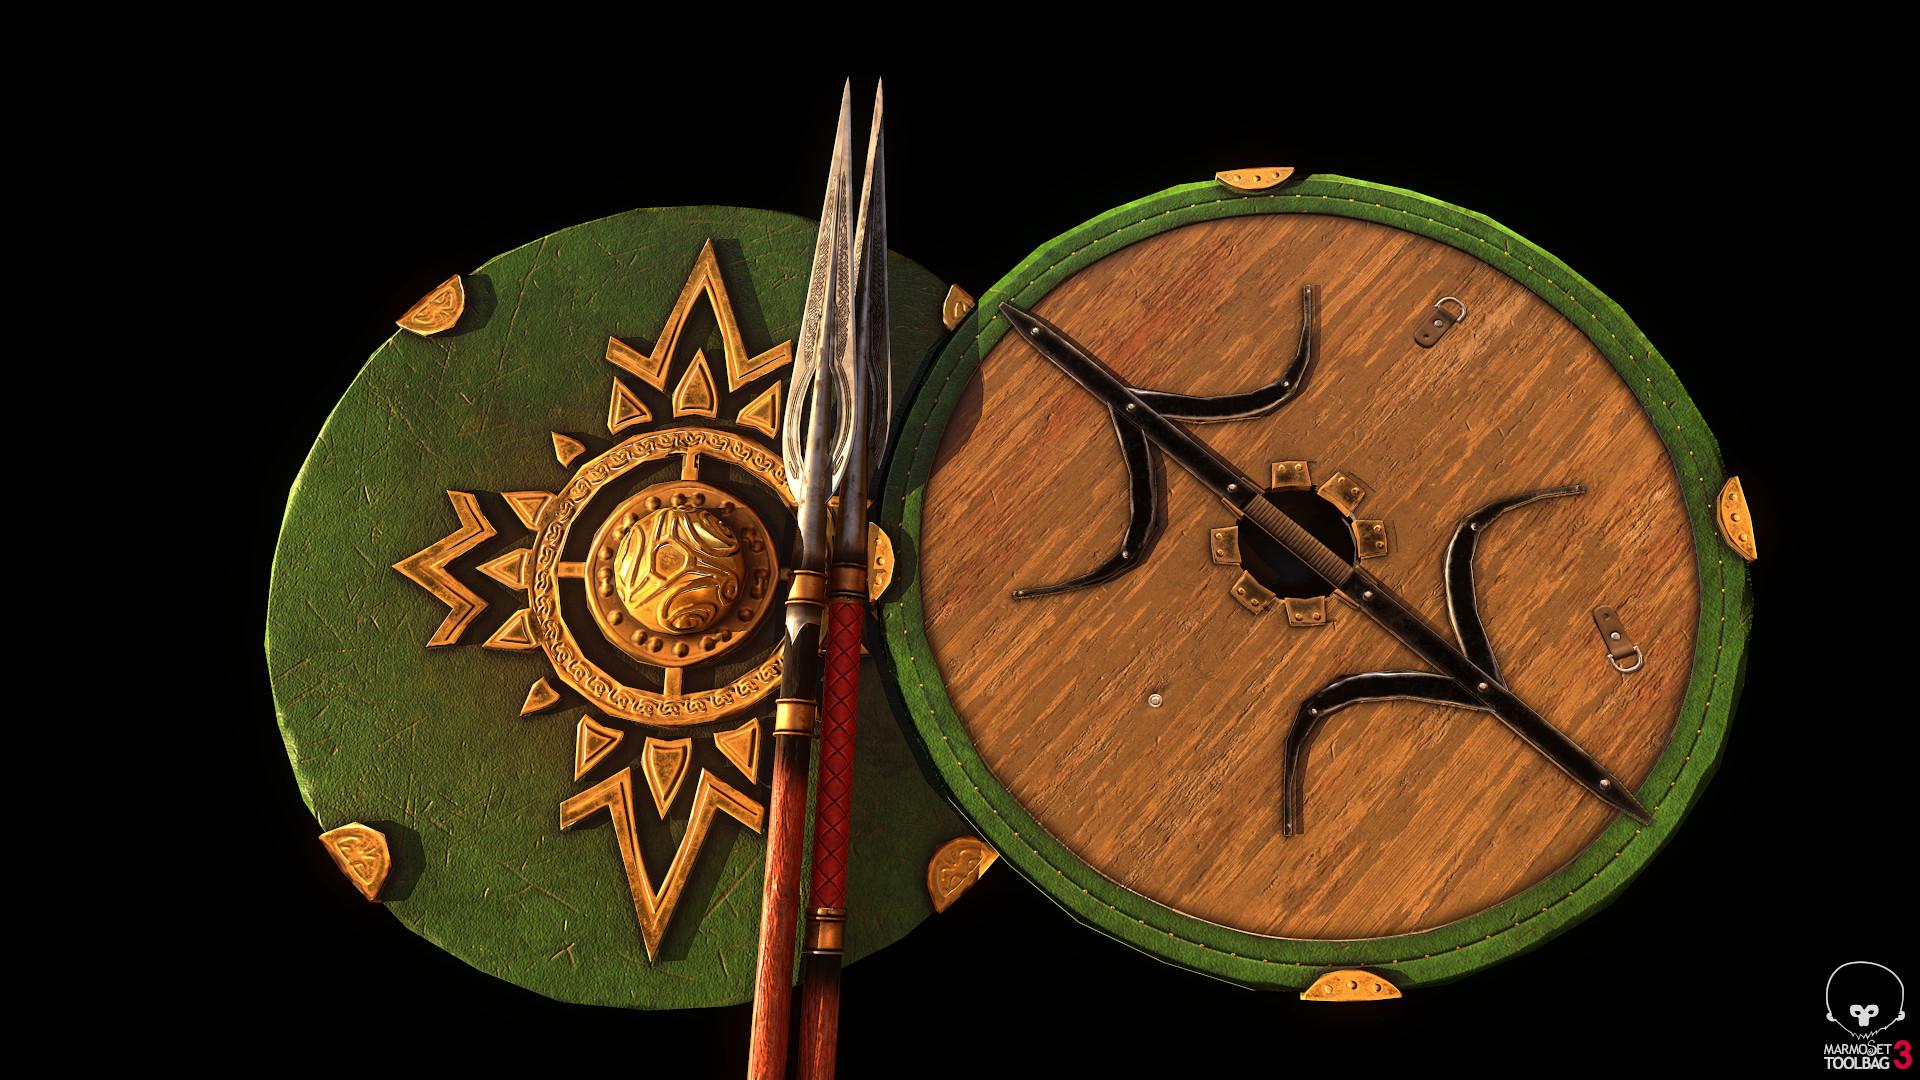 Bela csampai s4h rohan spear ornate 01 render mt 05